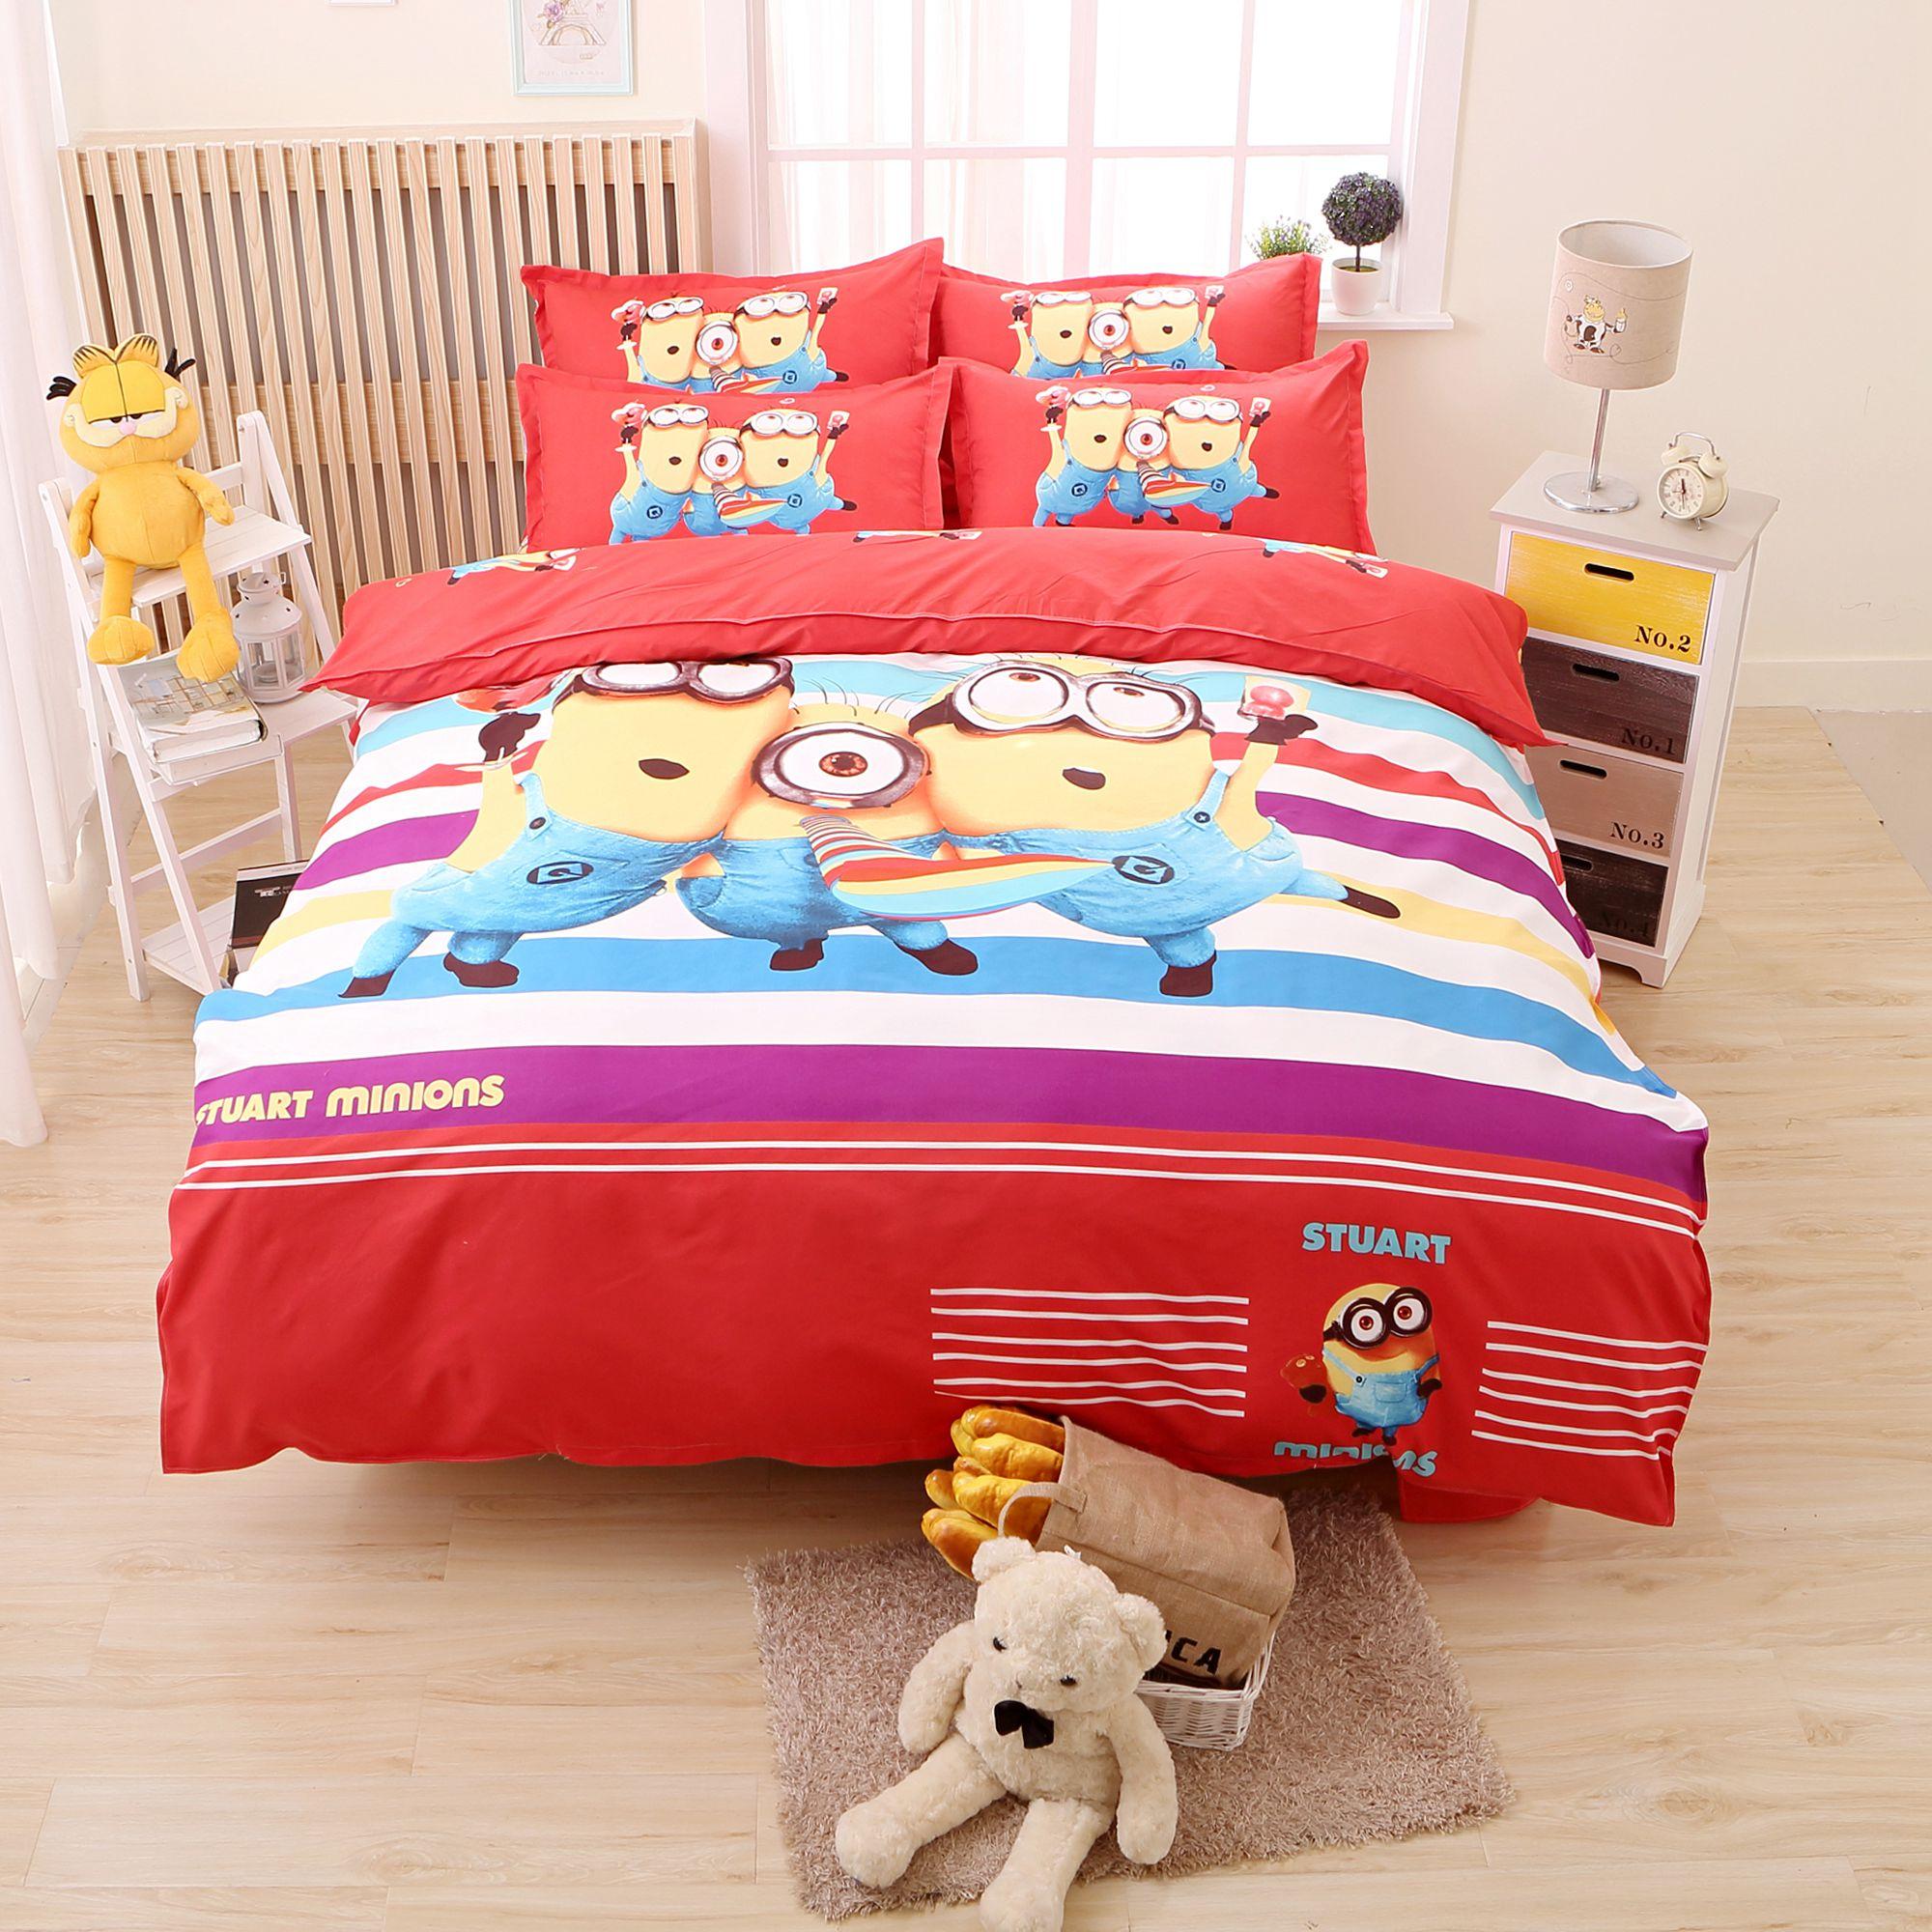 Hello kitty queen bed set - Children Kids Cute Cartoon Bedding Set Minions Pikachu Hello Kitty Printed Bedclothes Duvet Cover Set Twin